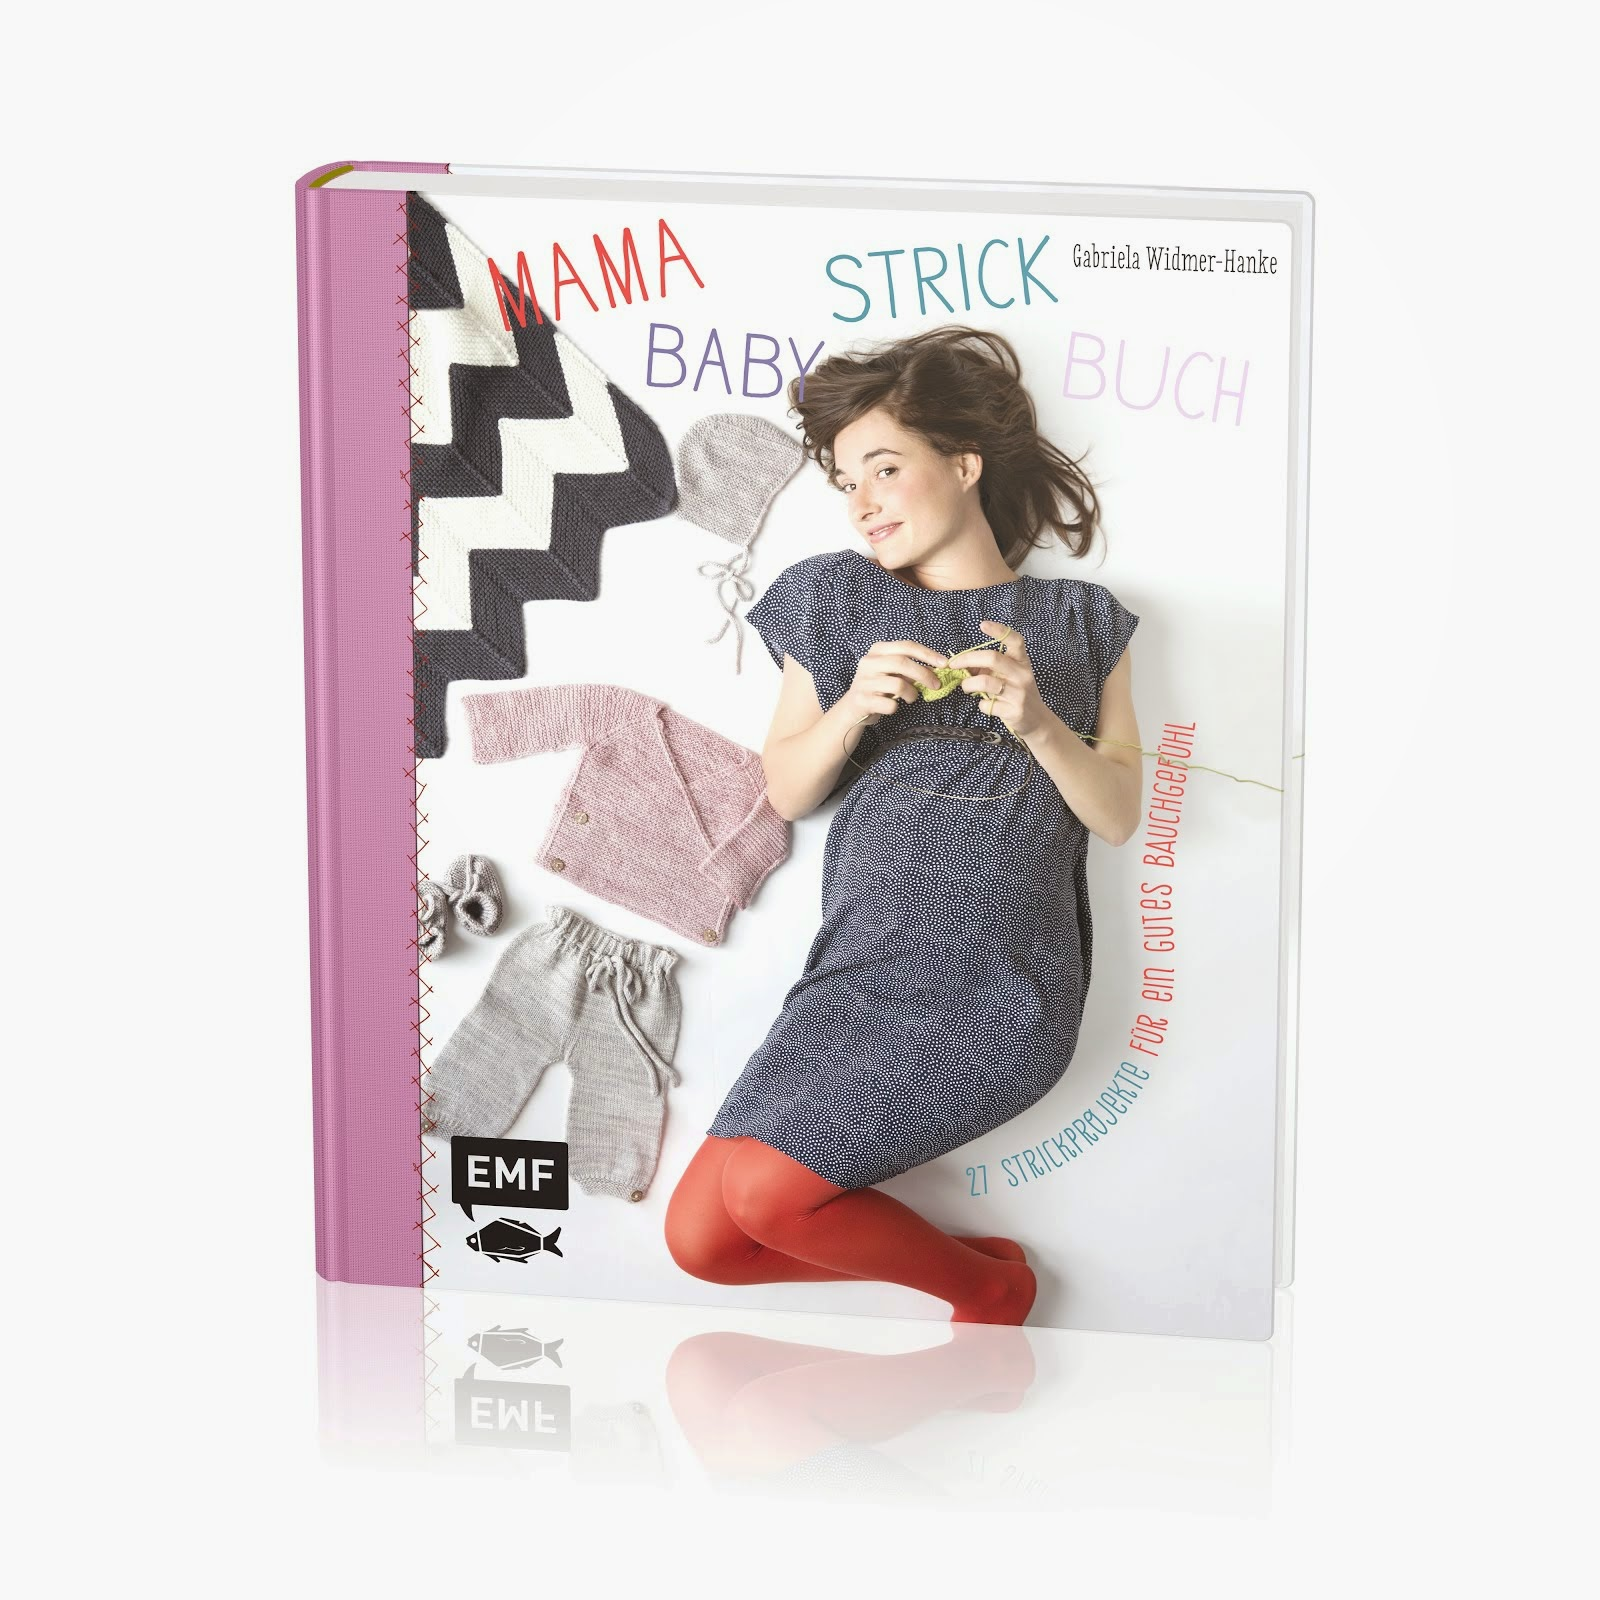 Mama Baby Strickbuch